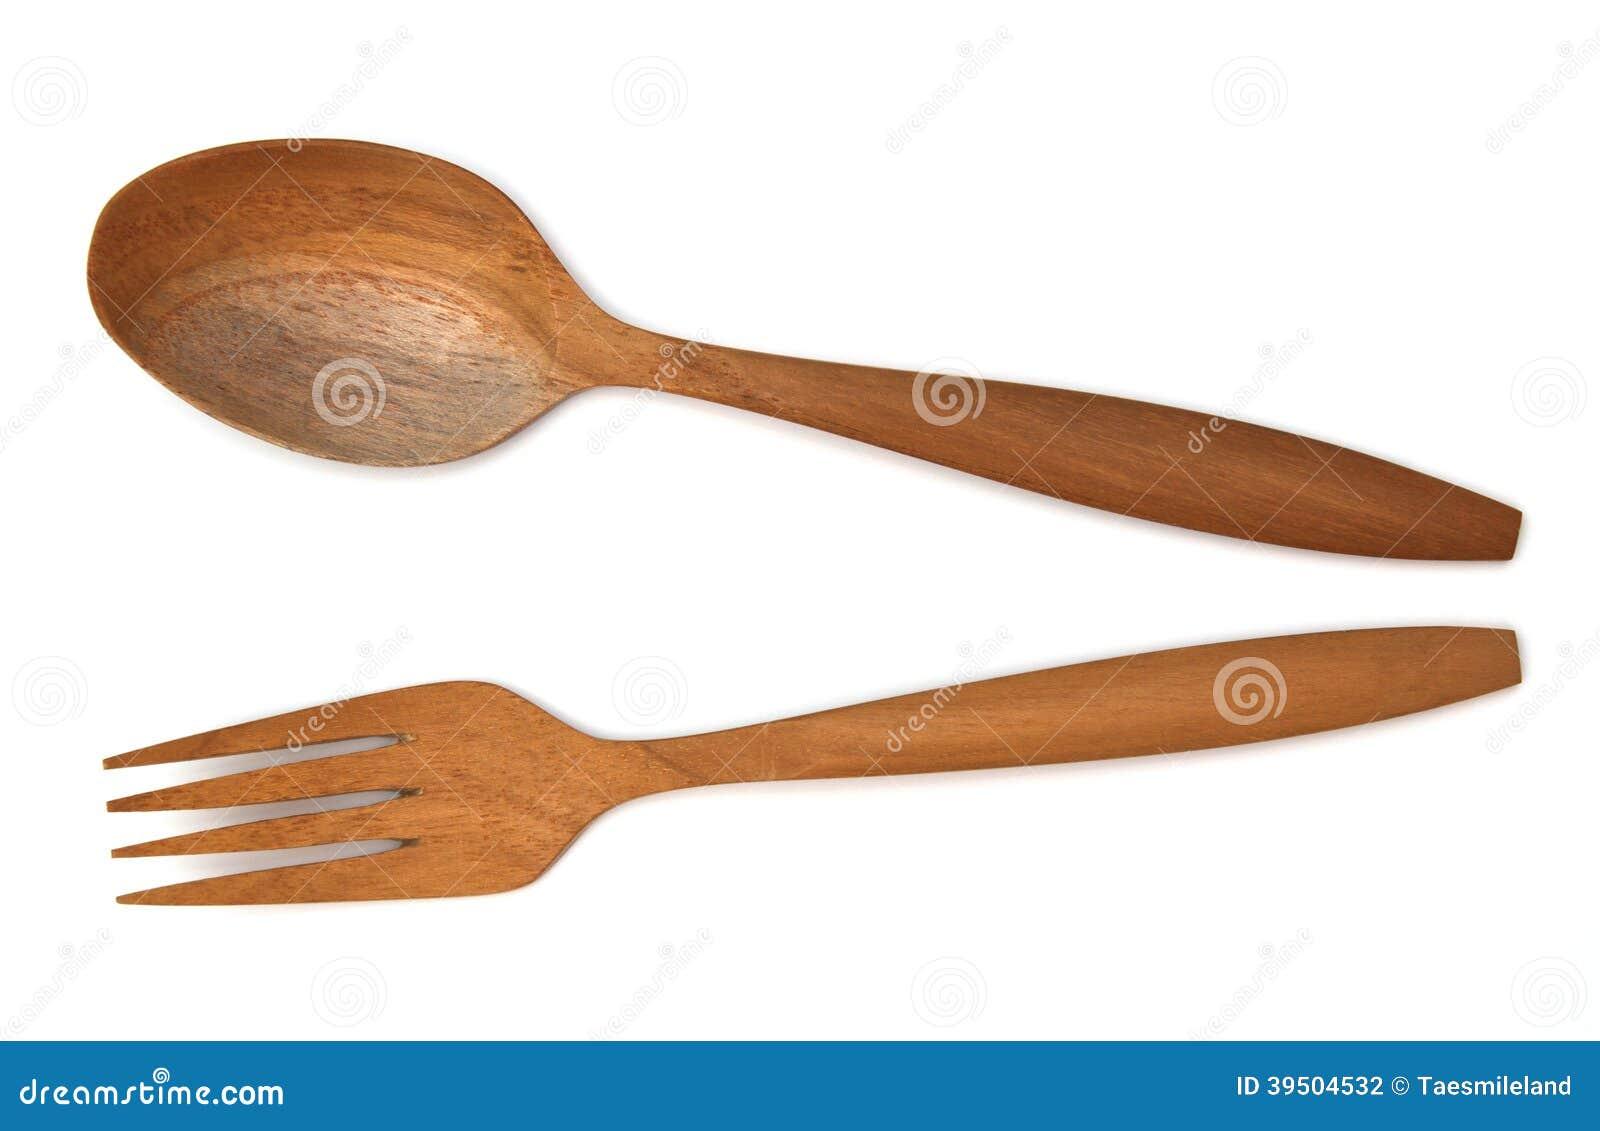 Wooden fork spoon